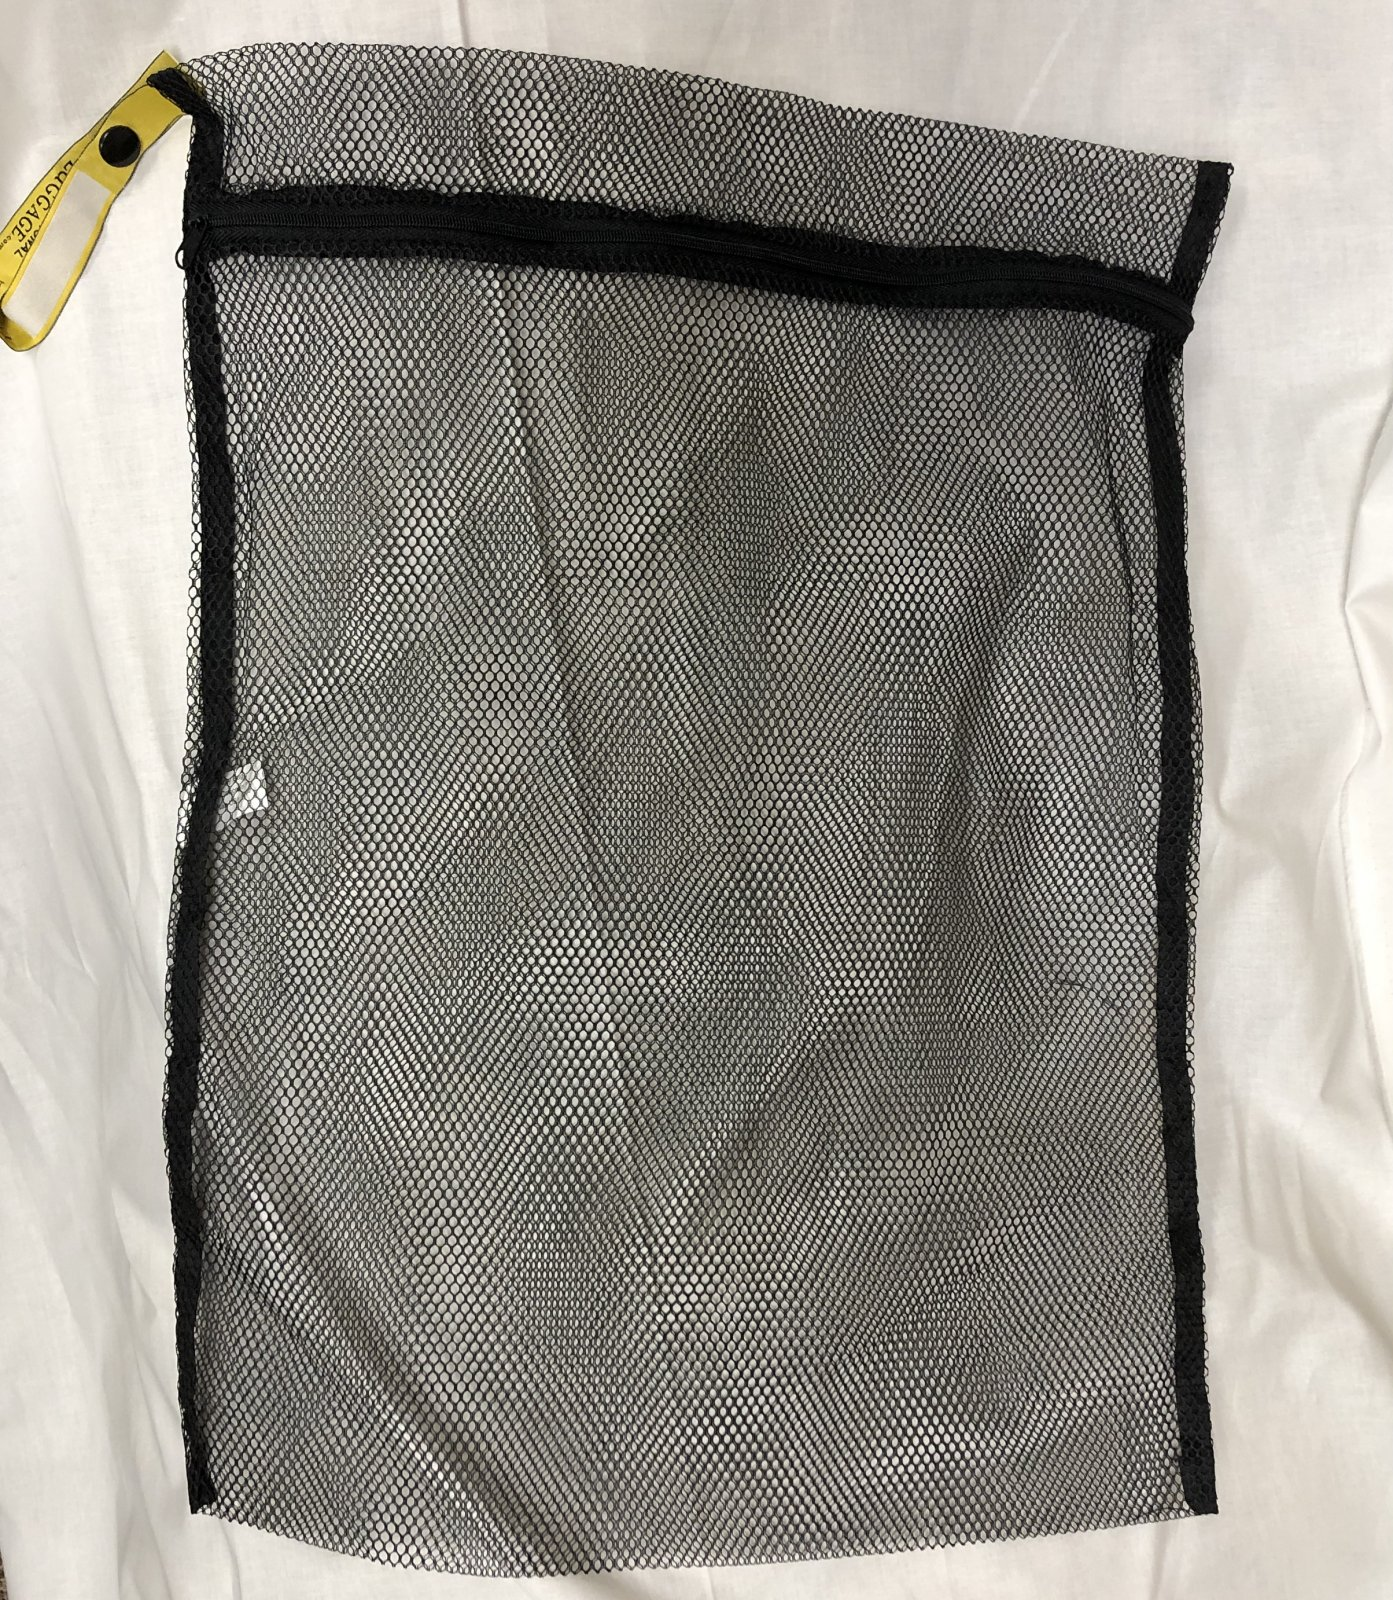 Black Small Zippered Mesh Laundry Bag, great for face masks/socks, 16 X 12